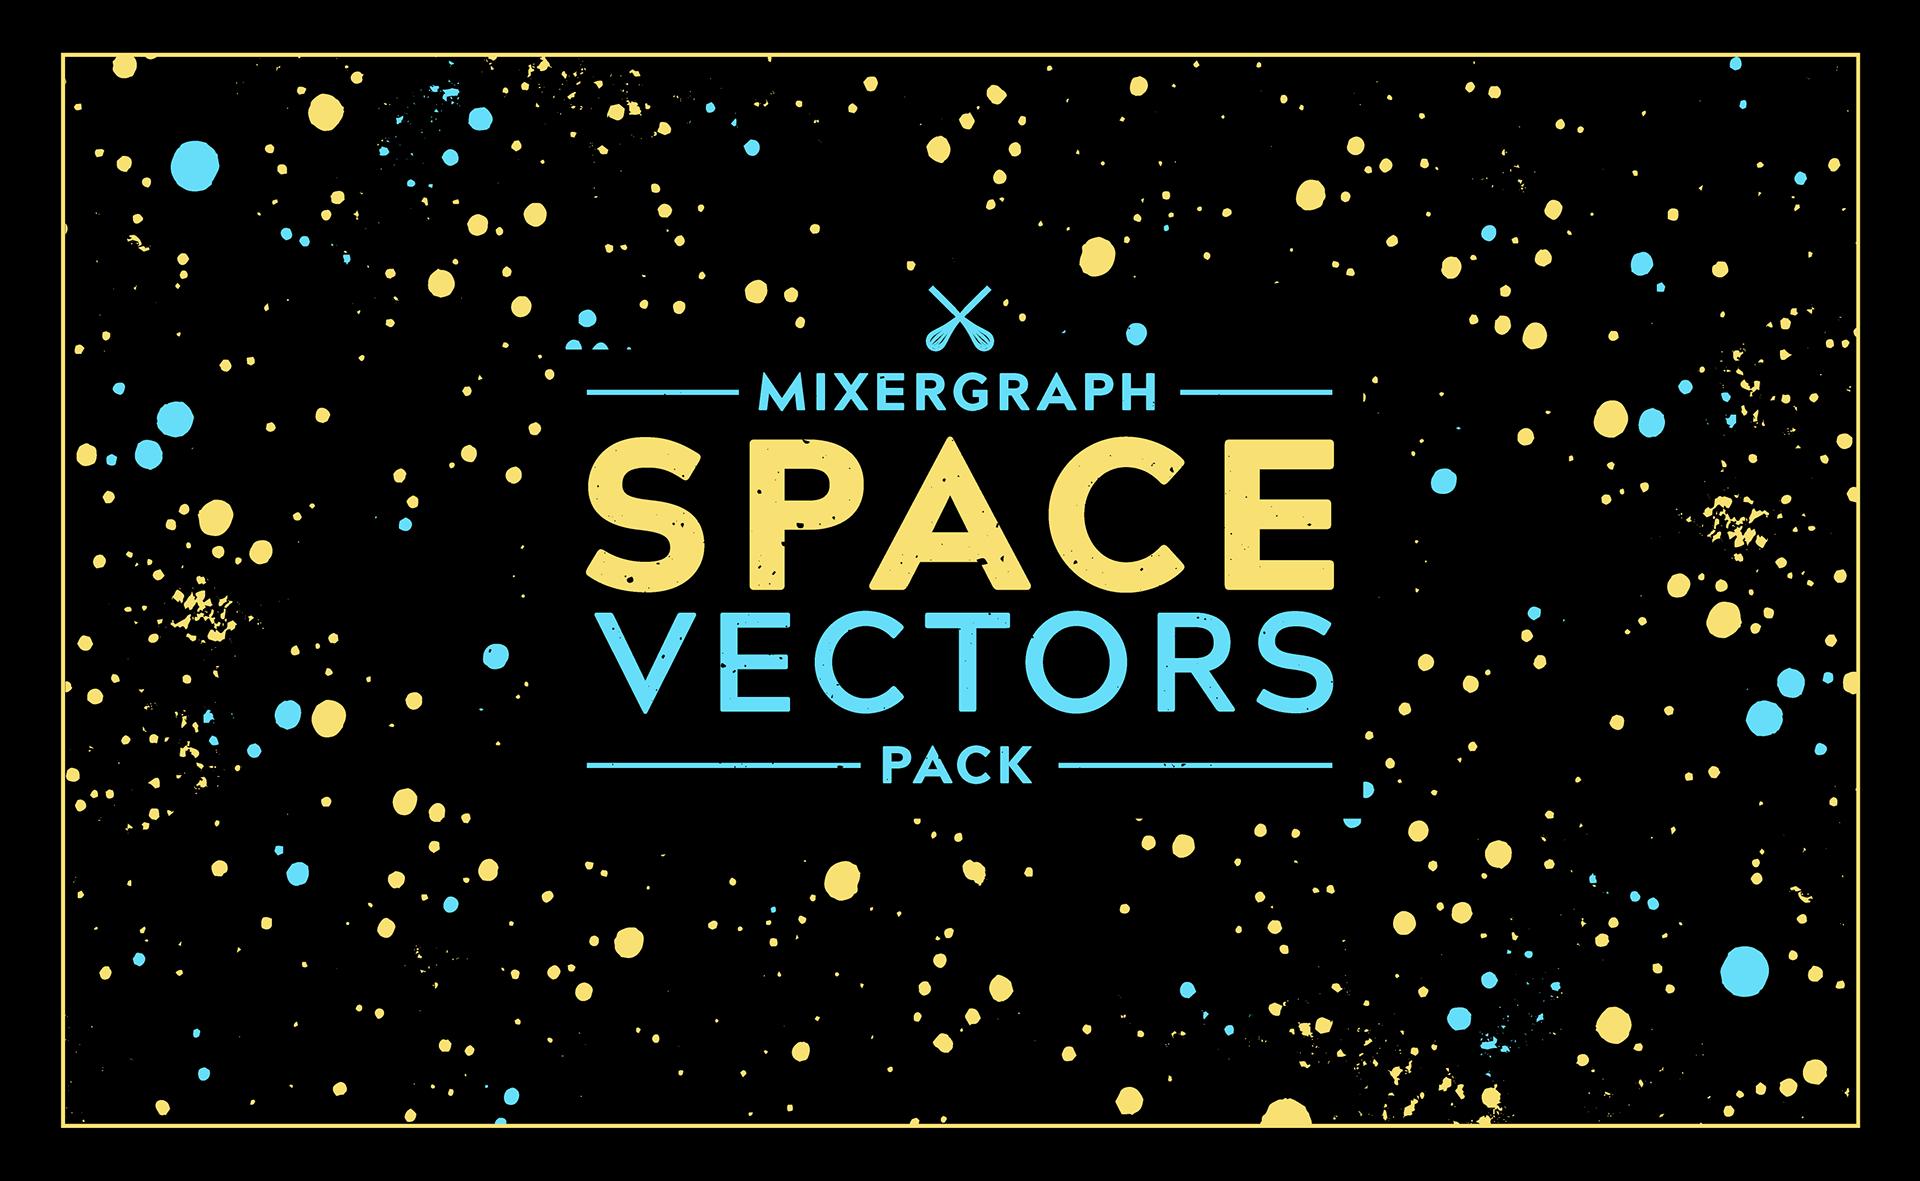 Mixergraph Space Vectors